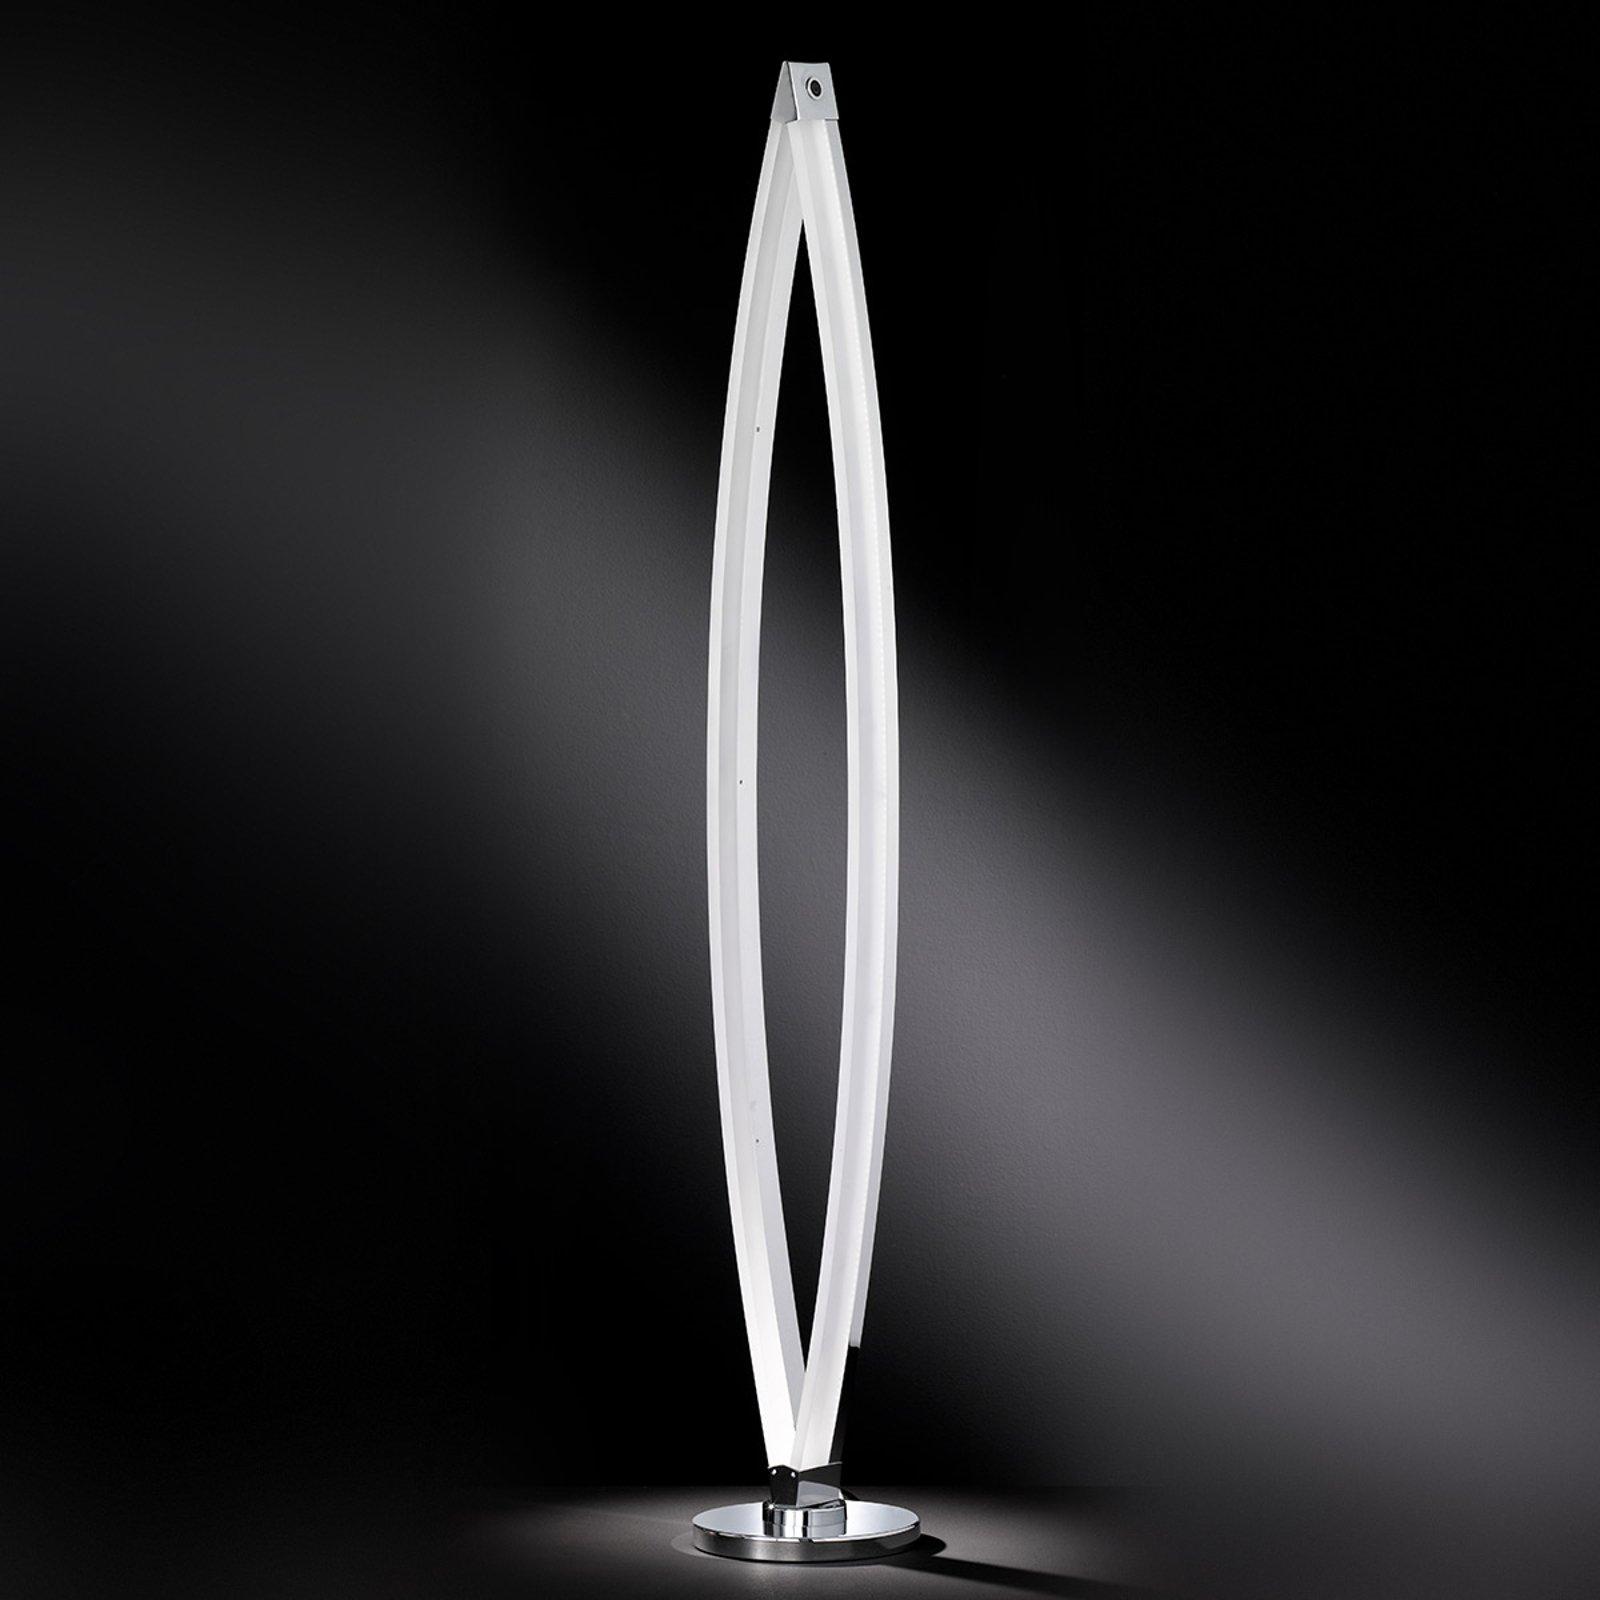 Tidsriktig stålampe Vannes med LED-lys